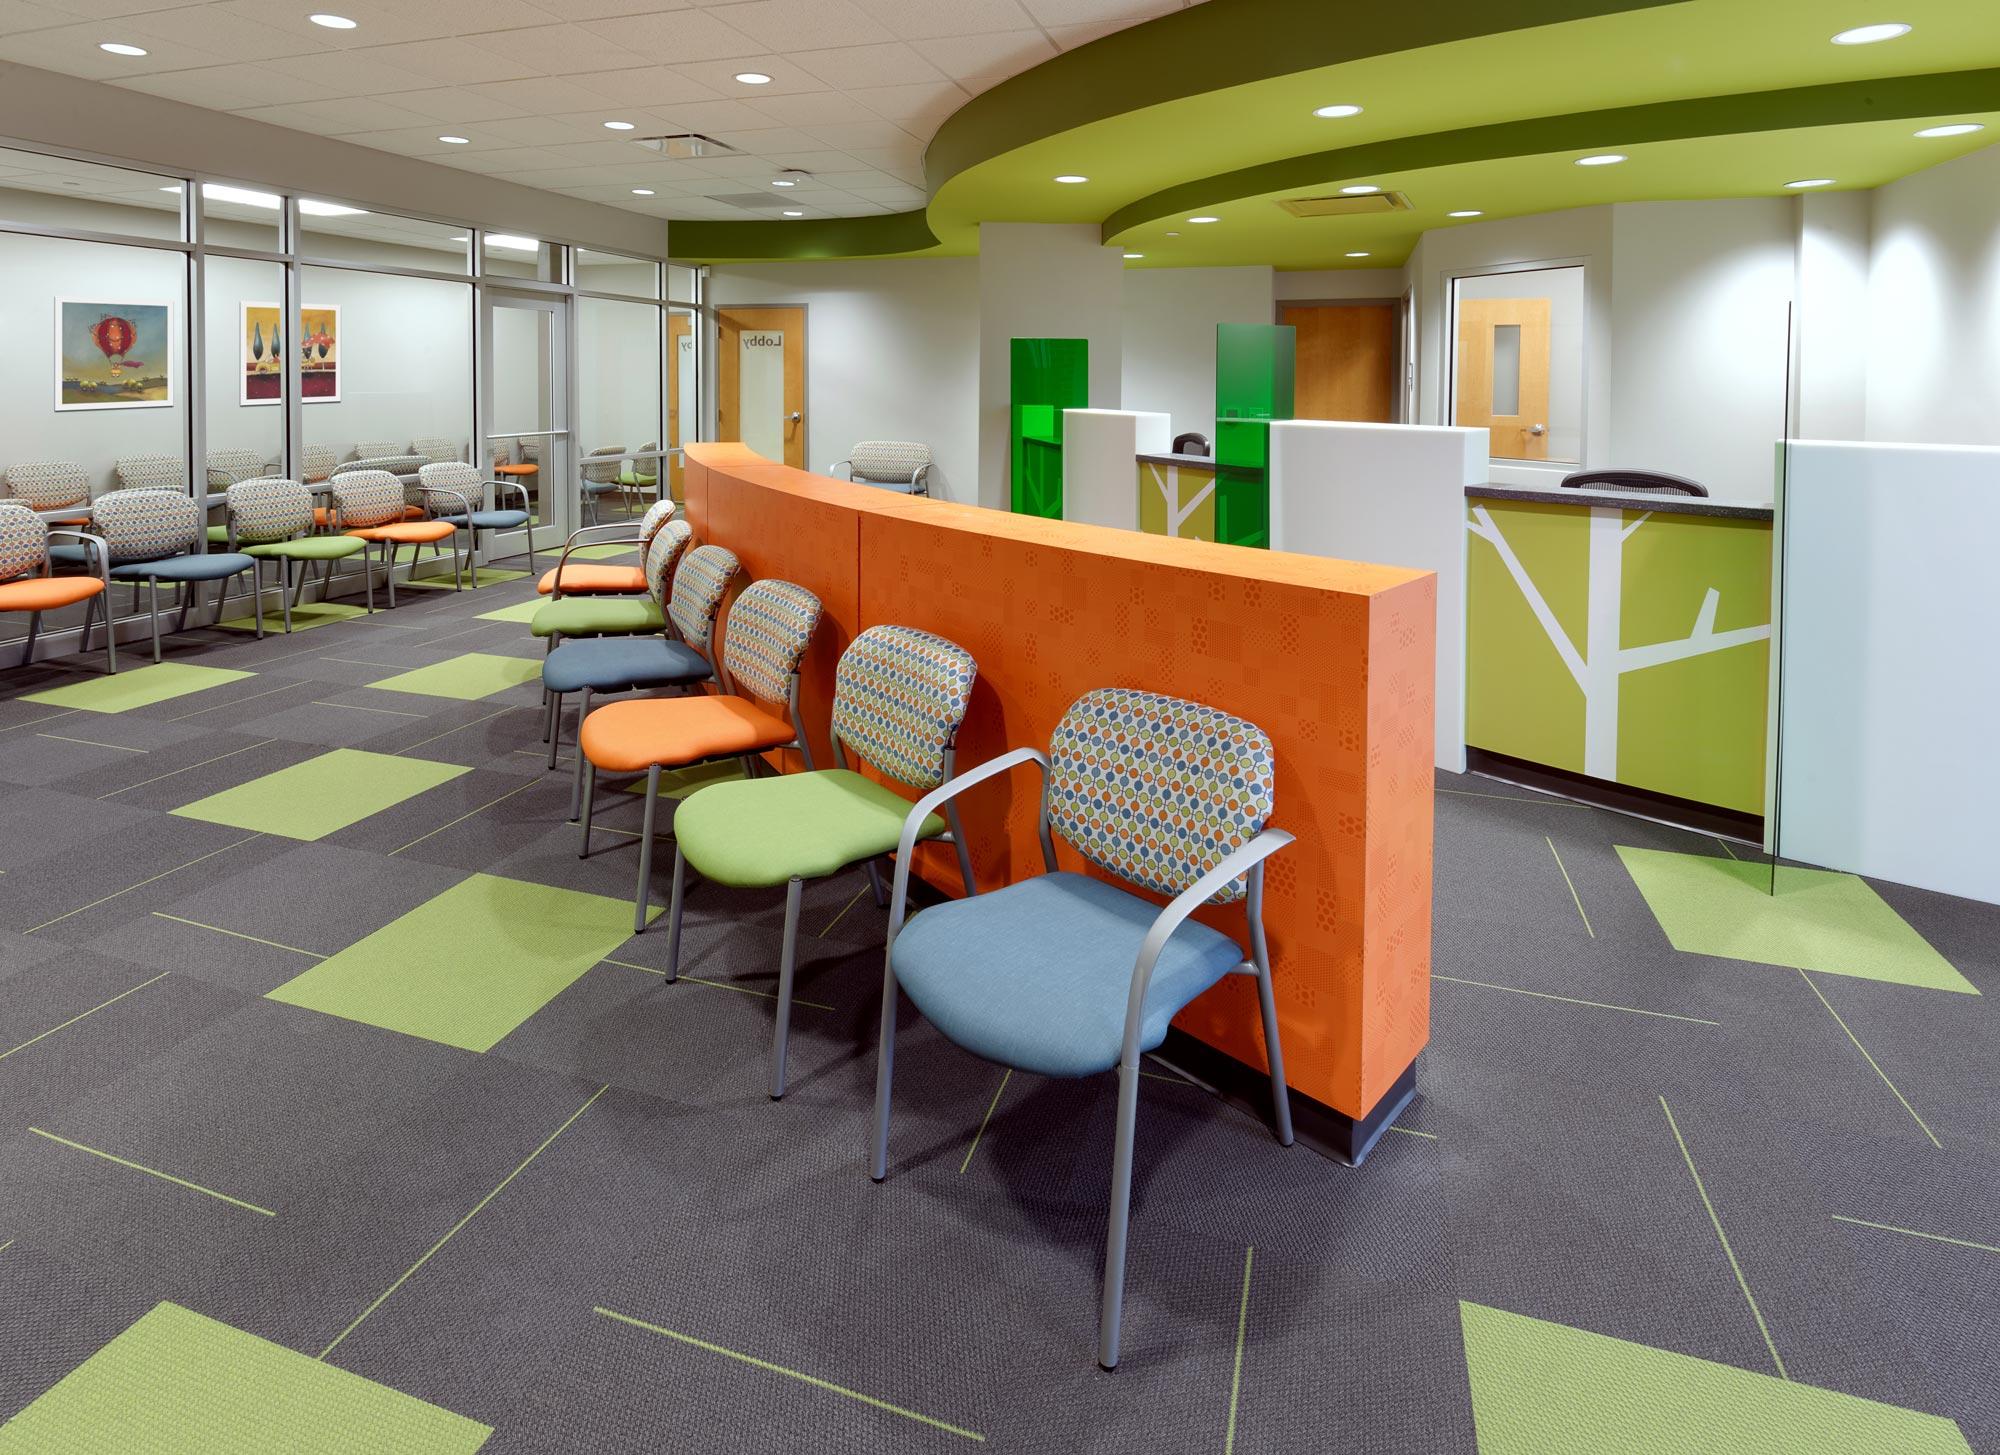 Butterfield-Park-Pediatrics-H-Design-Interior-01.jpg